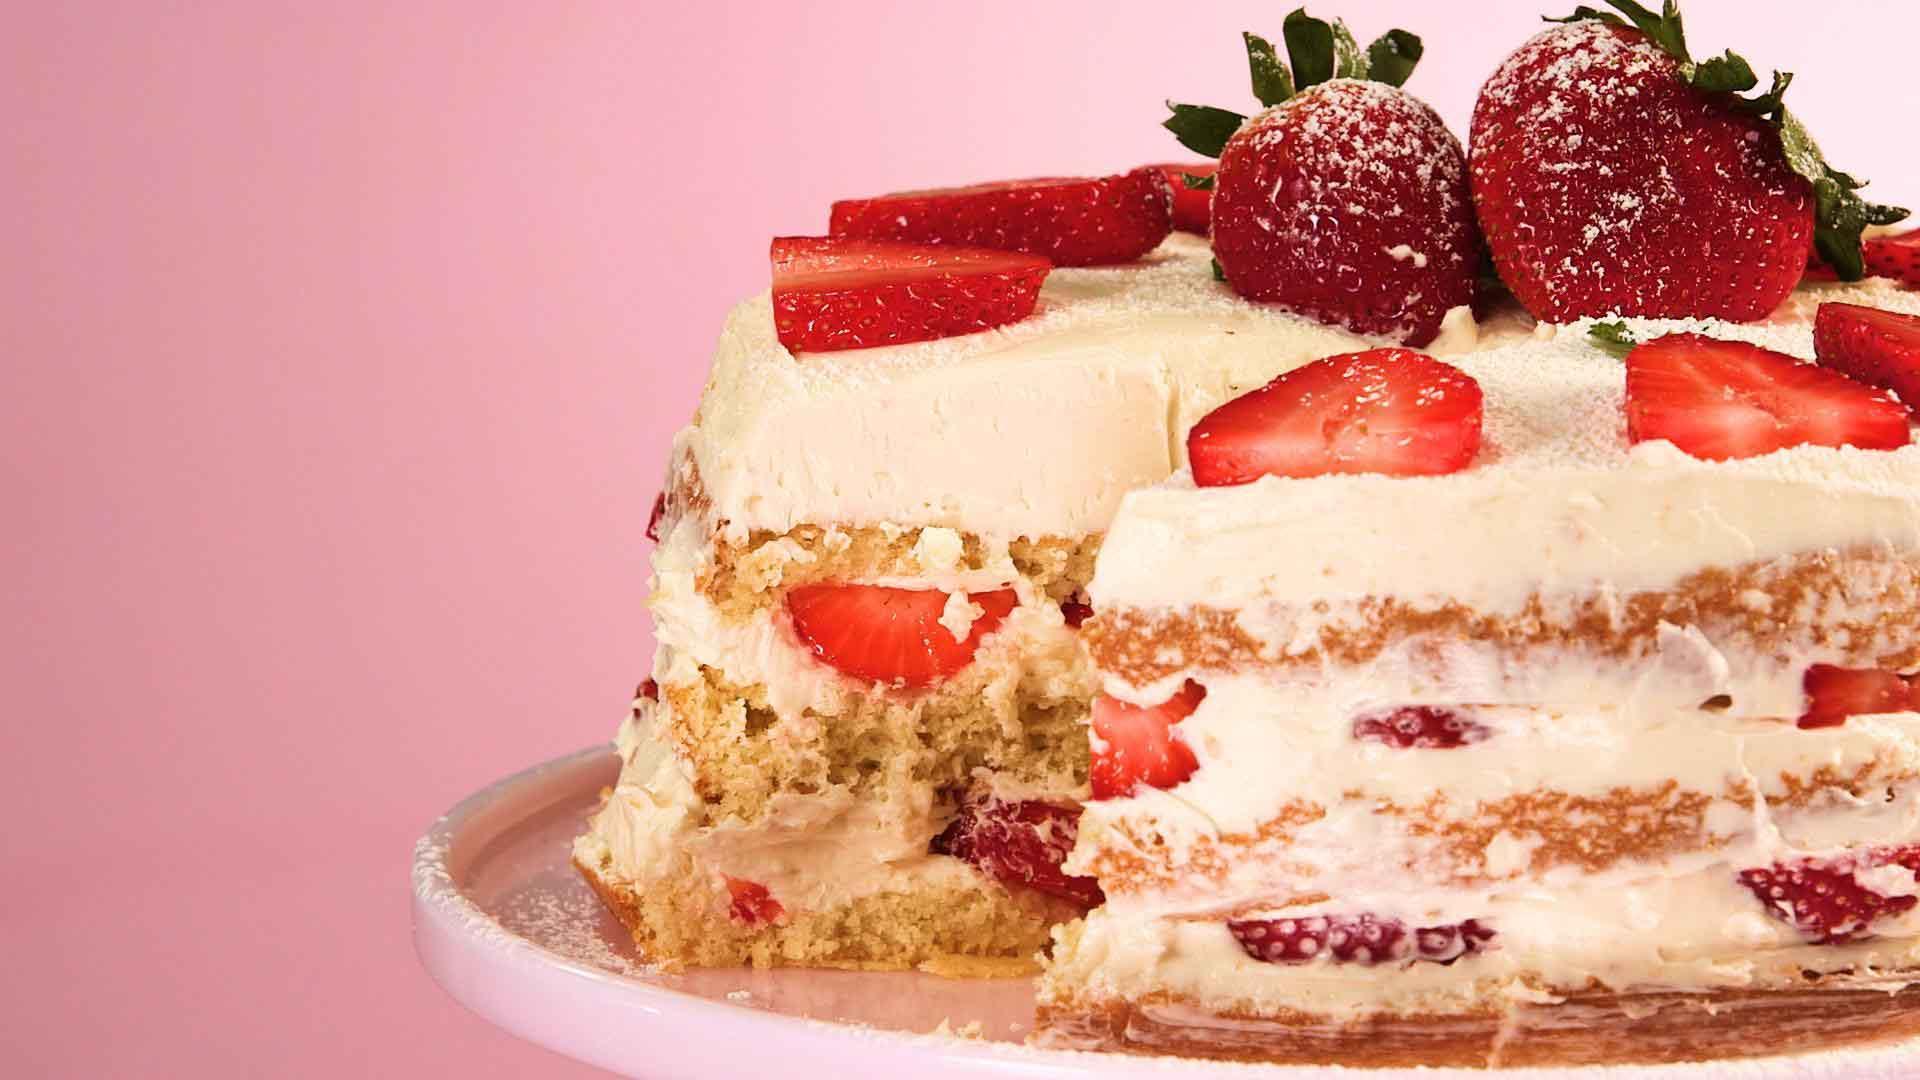 My Cake Maker Recipes List: Basic Naked Cake Recipe